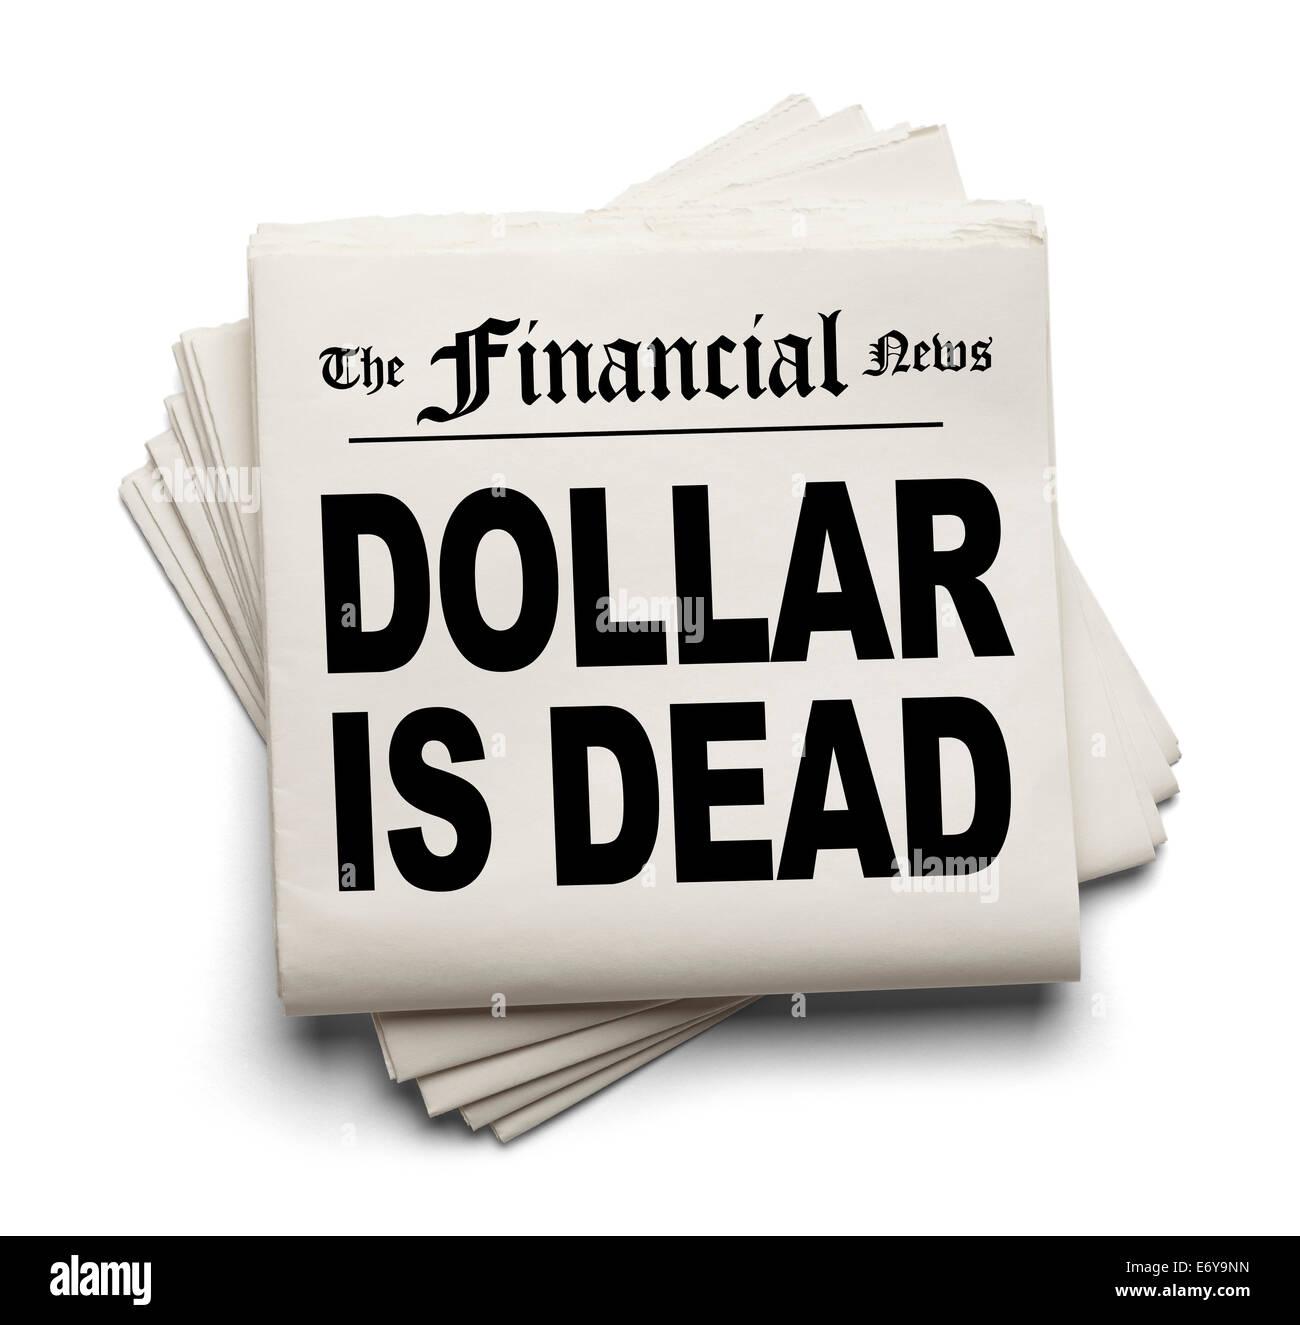 Finance News: Financial News Stock Photos & Financial News Stock Images